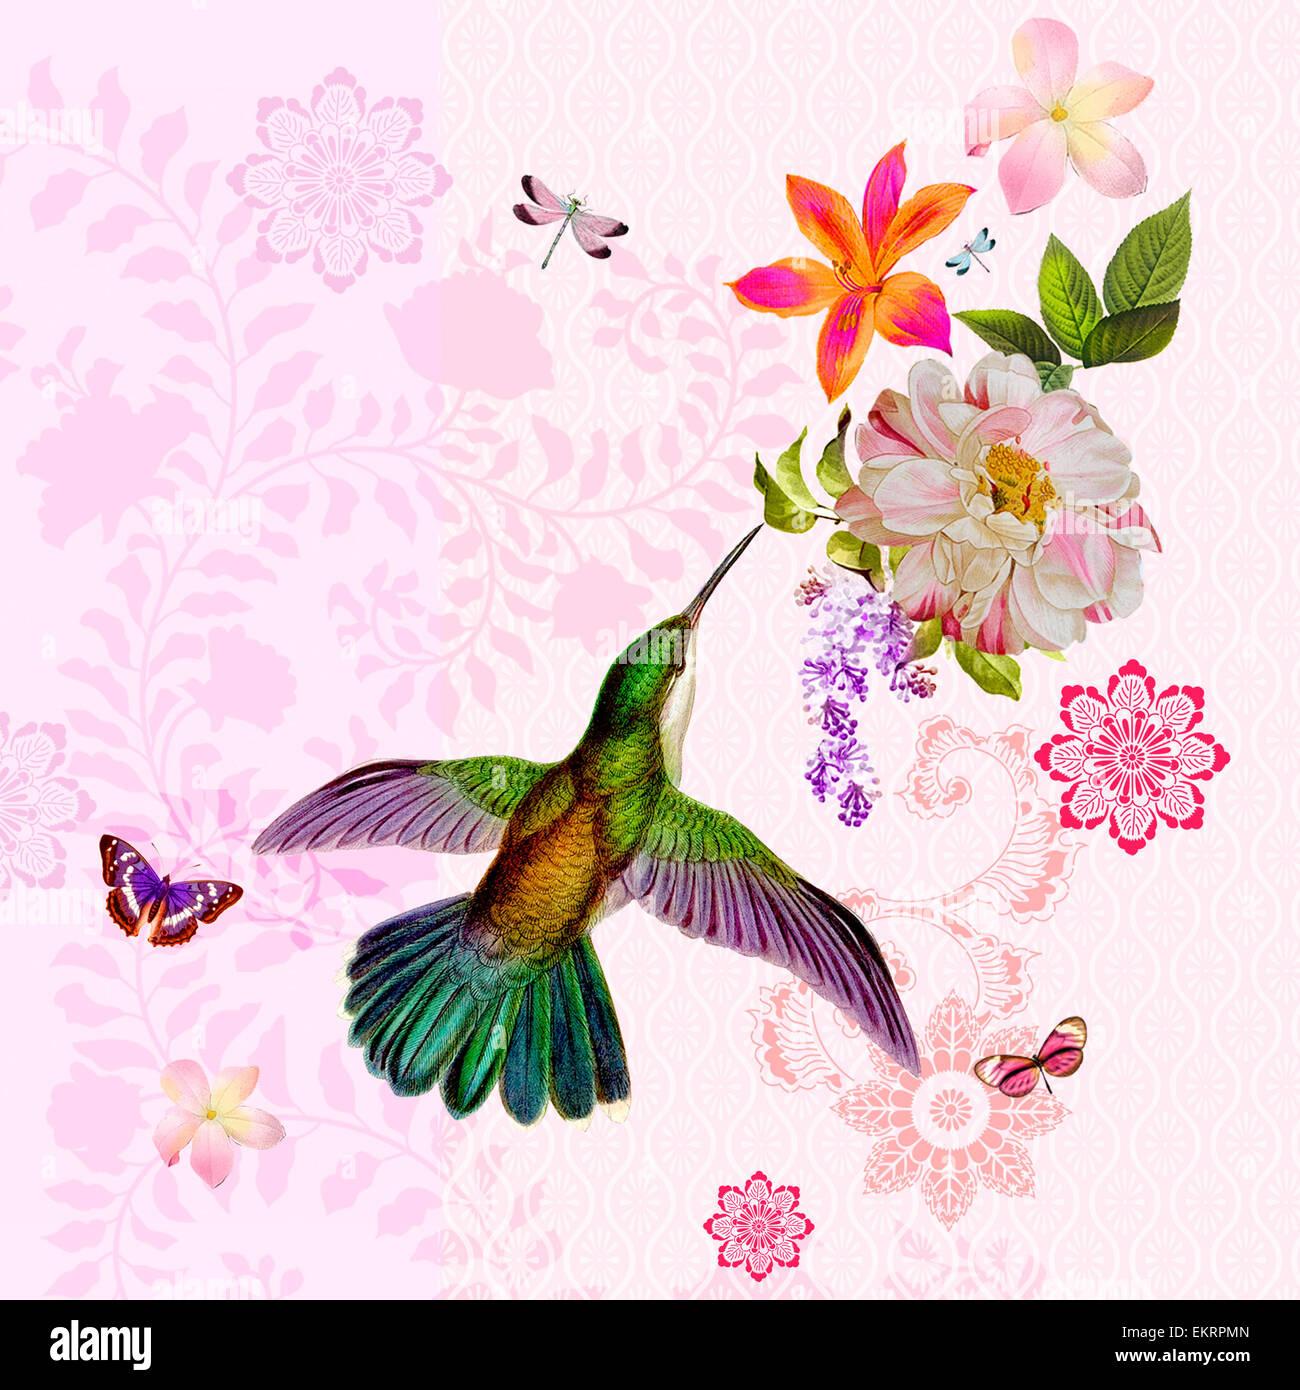 Exotic Bird Flowers Illustration Paper Ornament Graphic Art